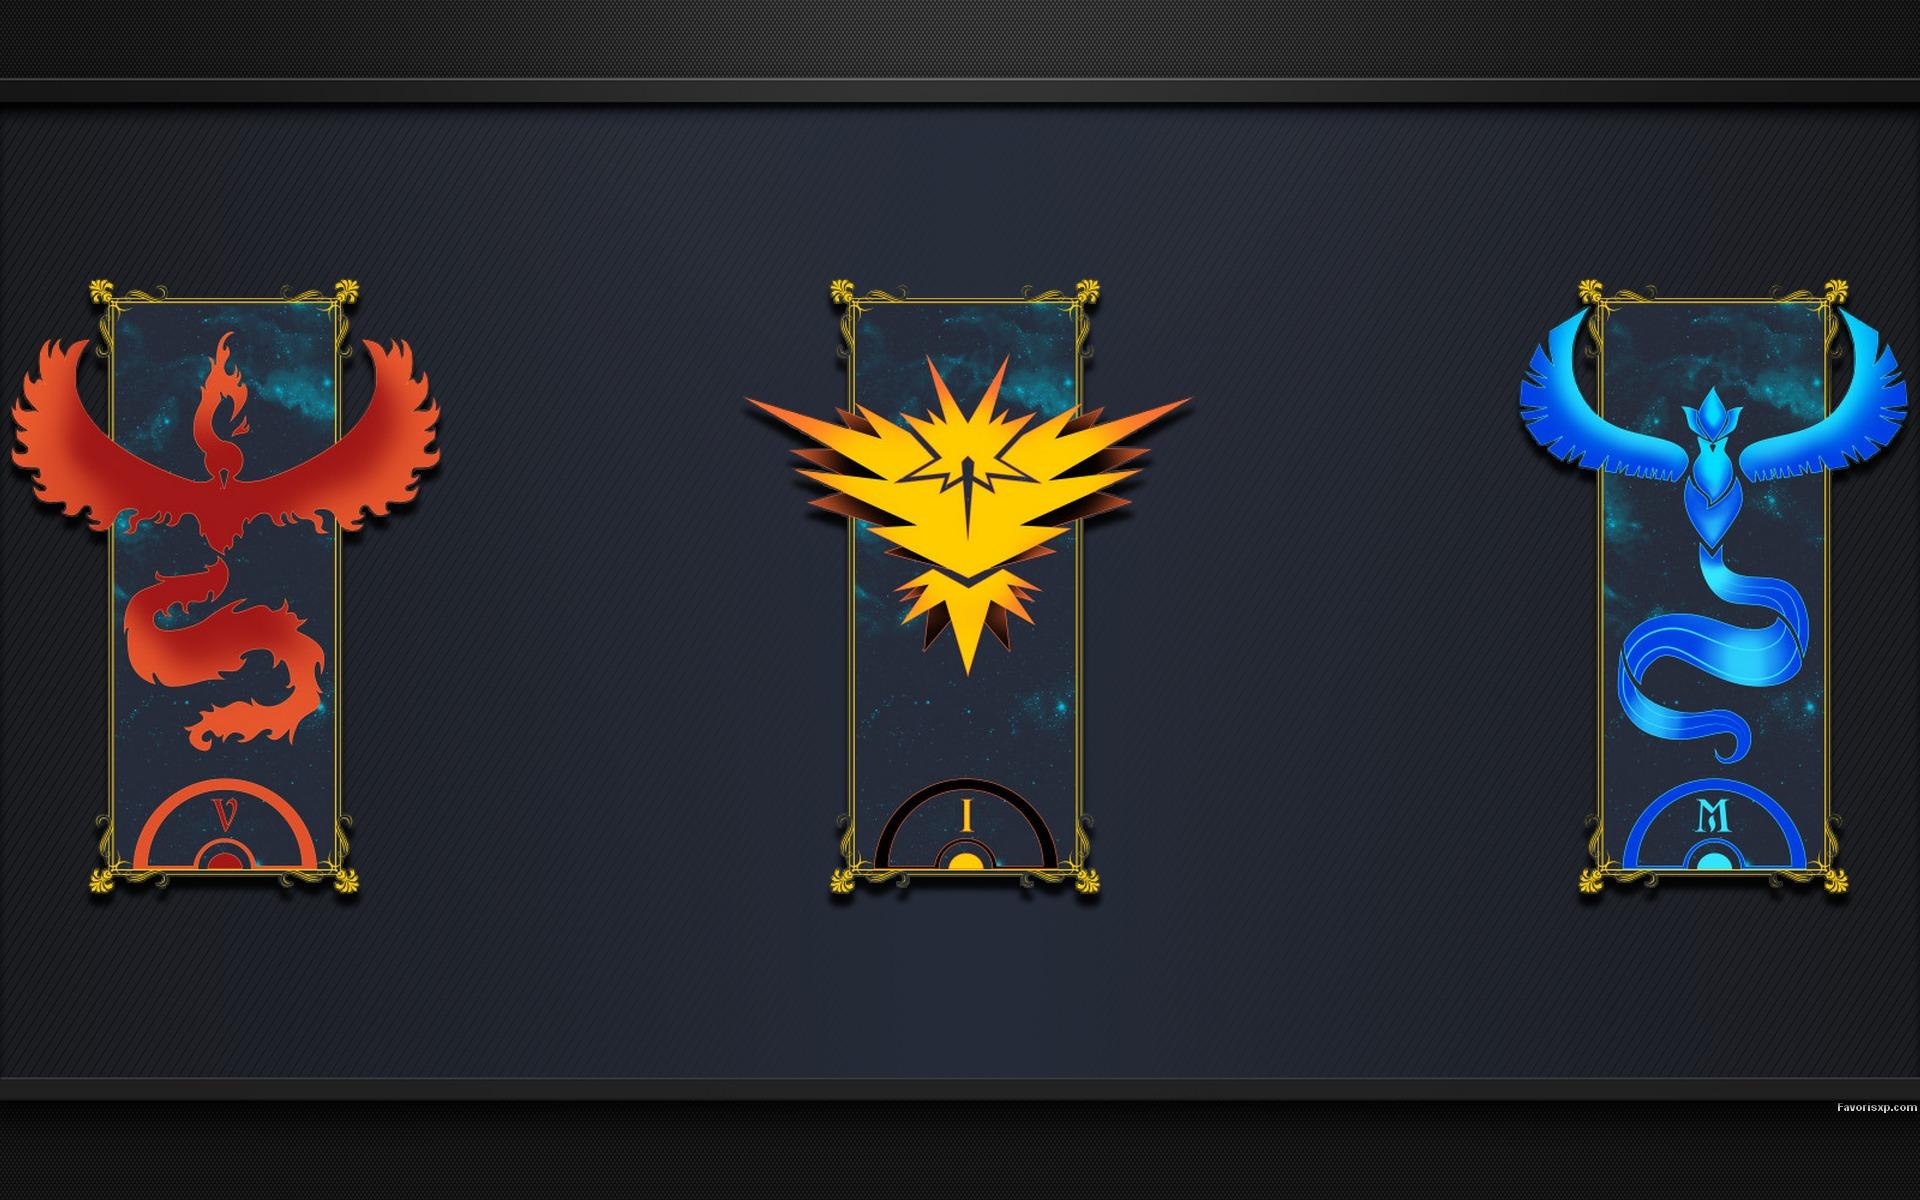 15 Pokémon GO Fonds d'écran - Instinct - Mystic - Valor.